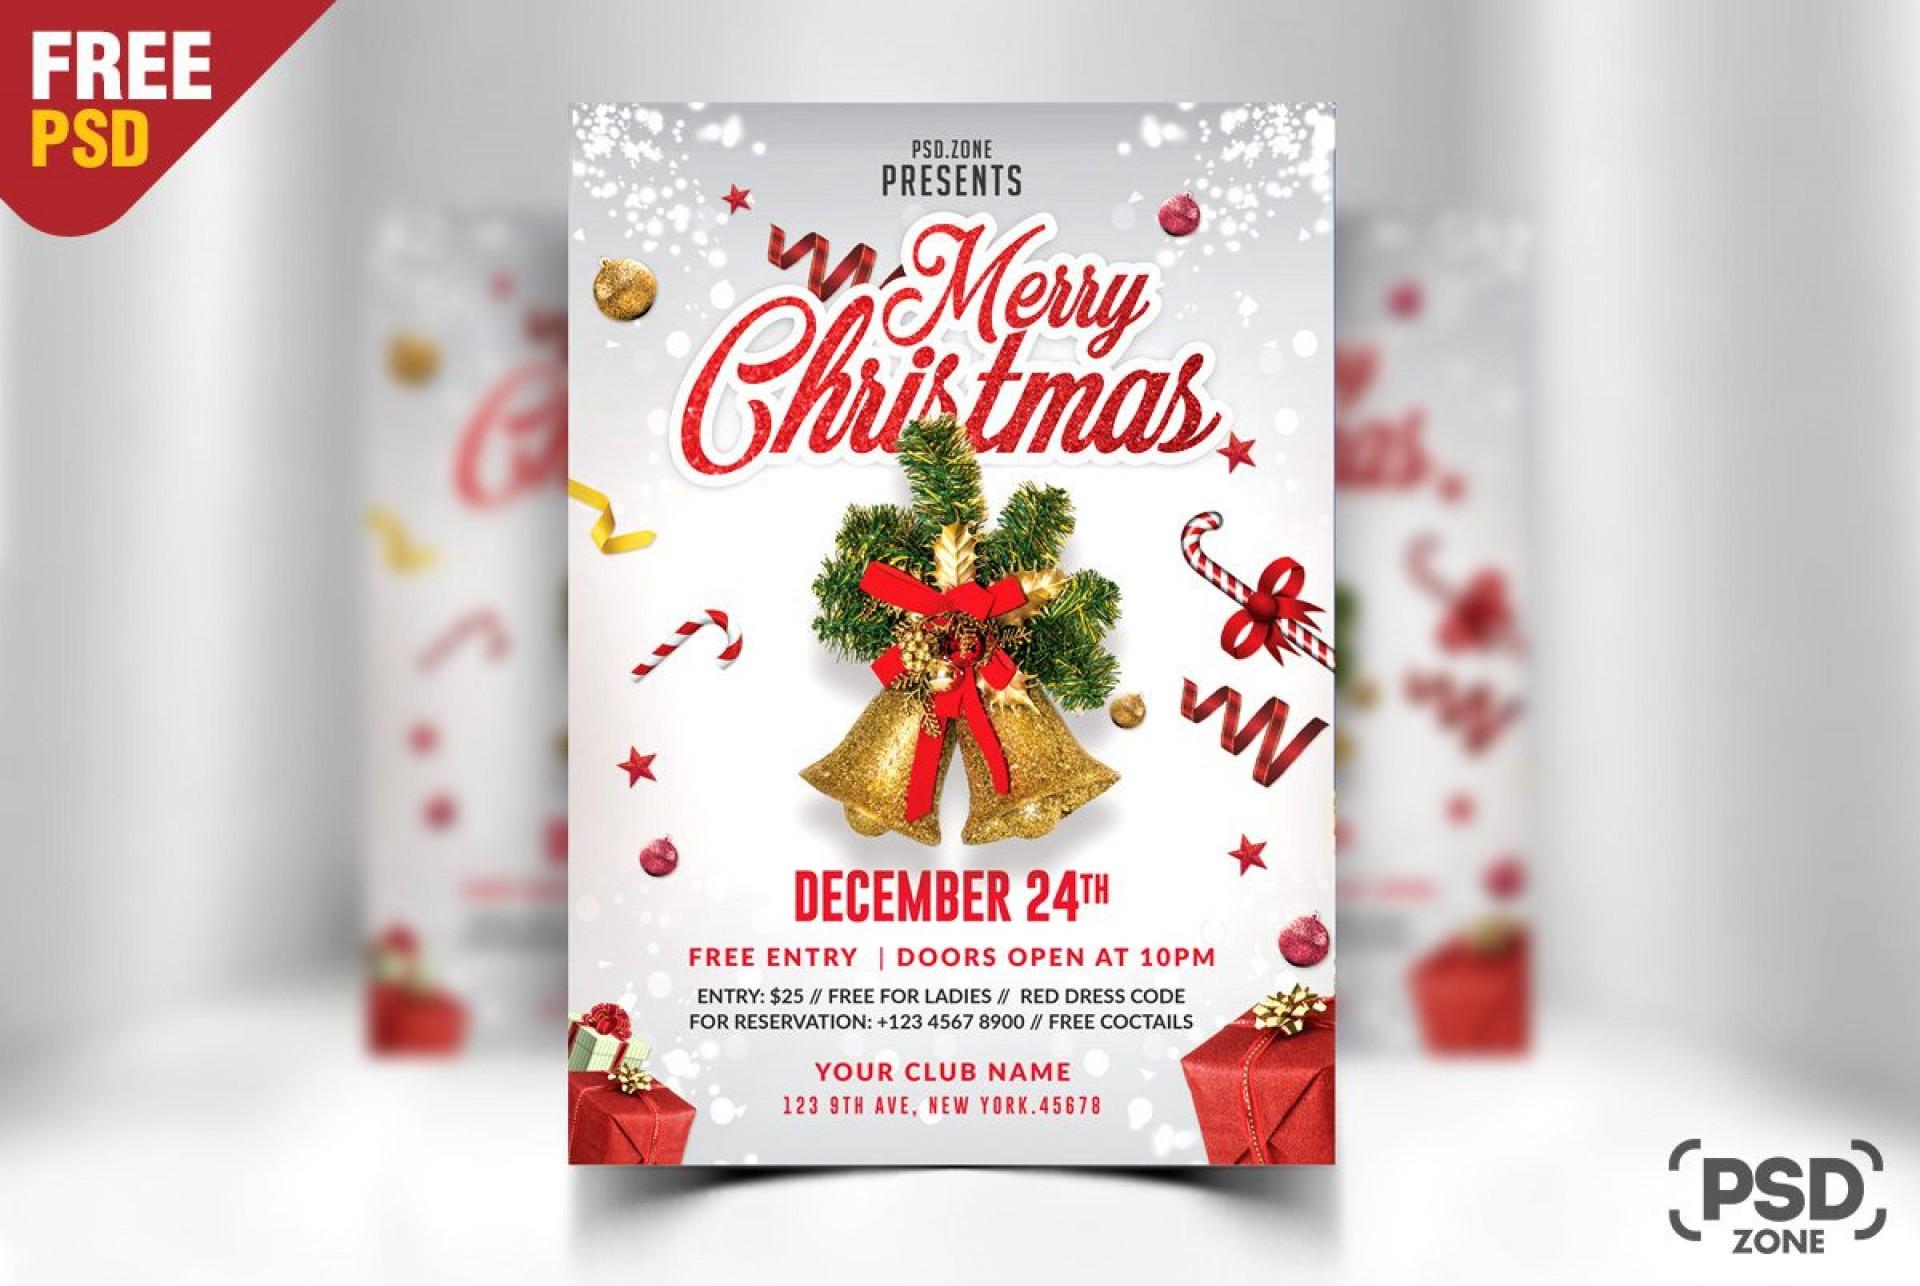 008 Singular Free Christma Poster Template Sample  Uk Party Download Fair1920